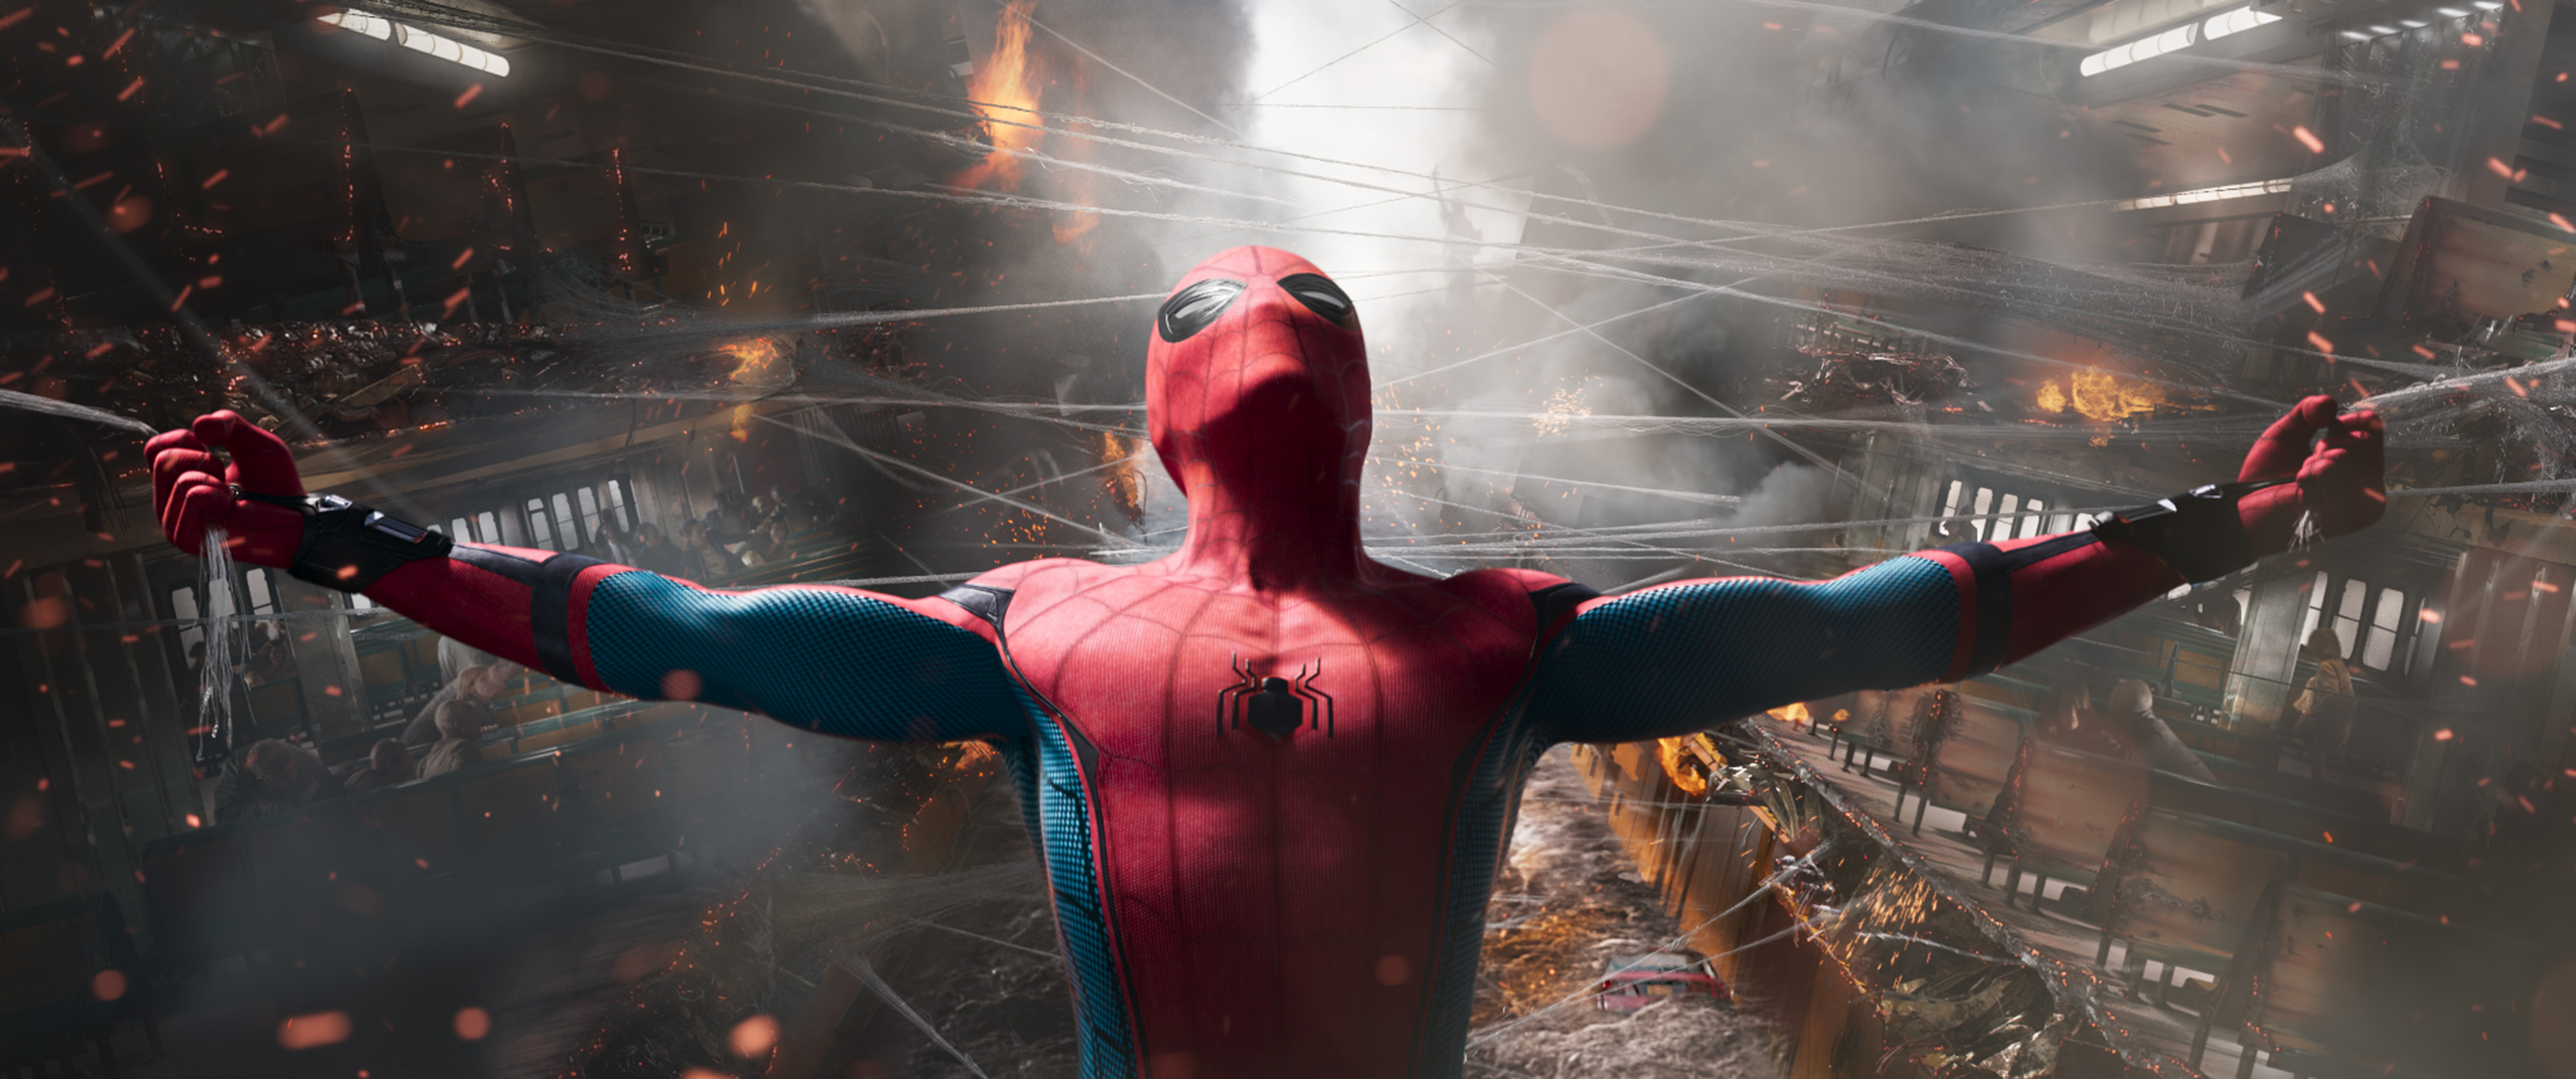 33. Spider-Man Homecoming